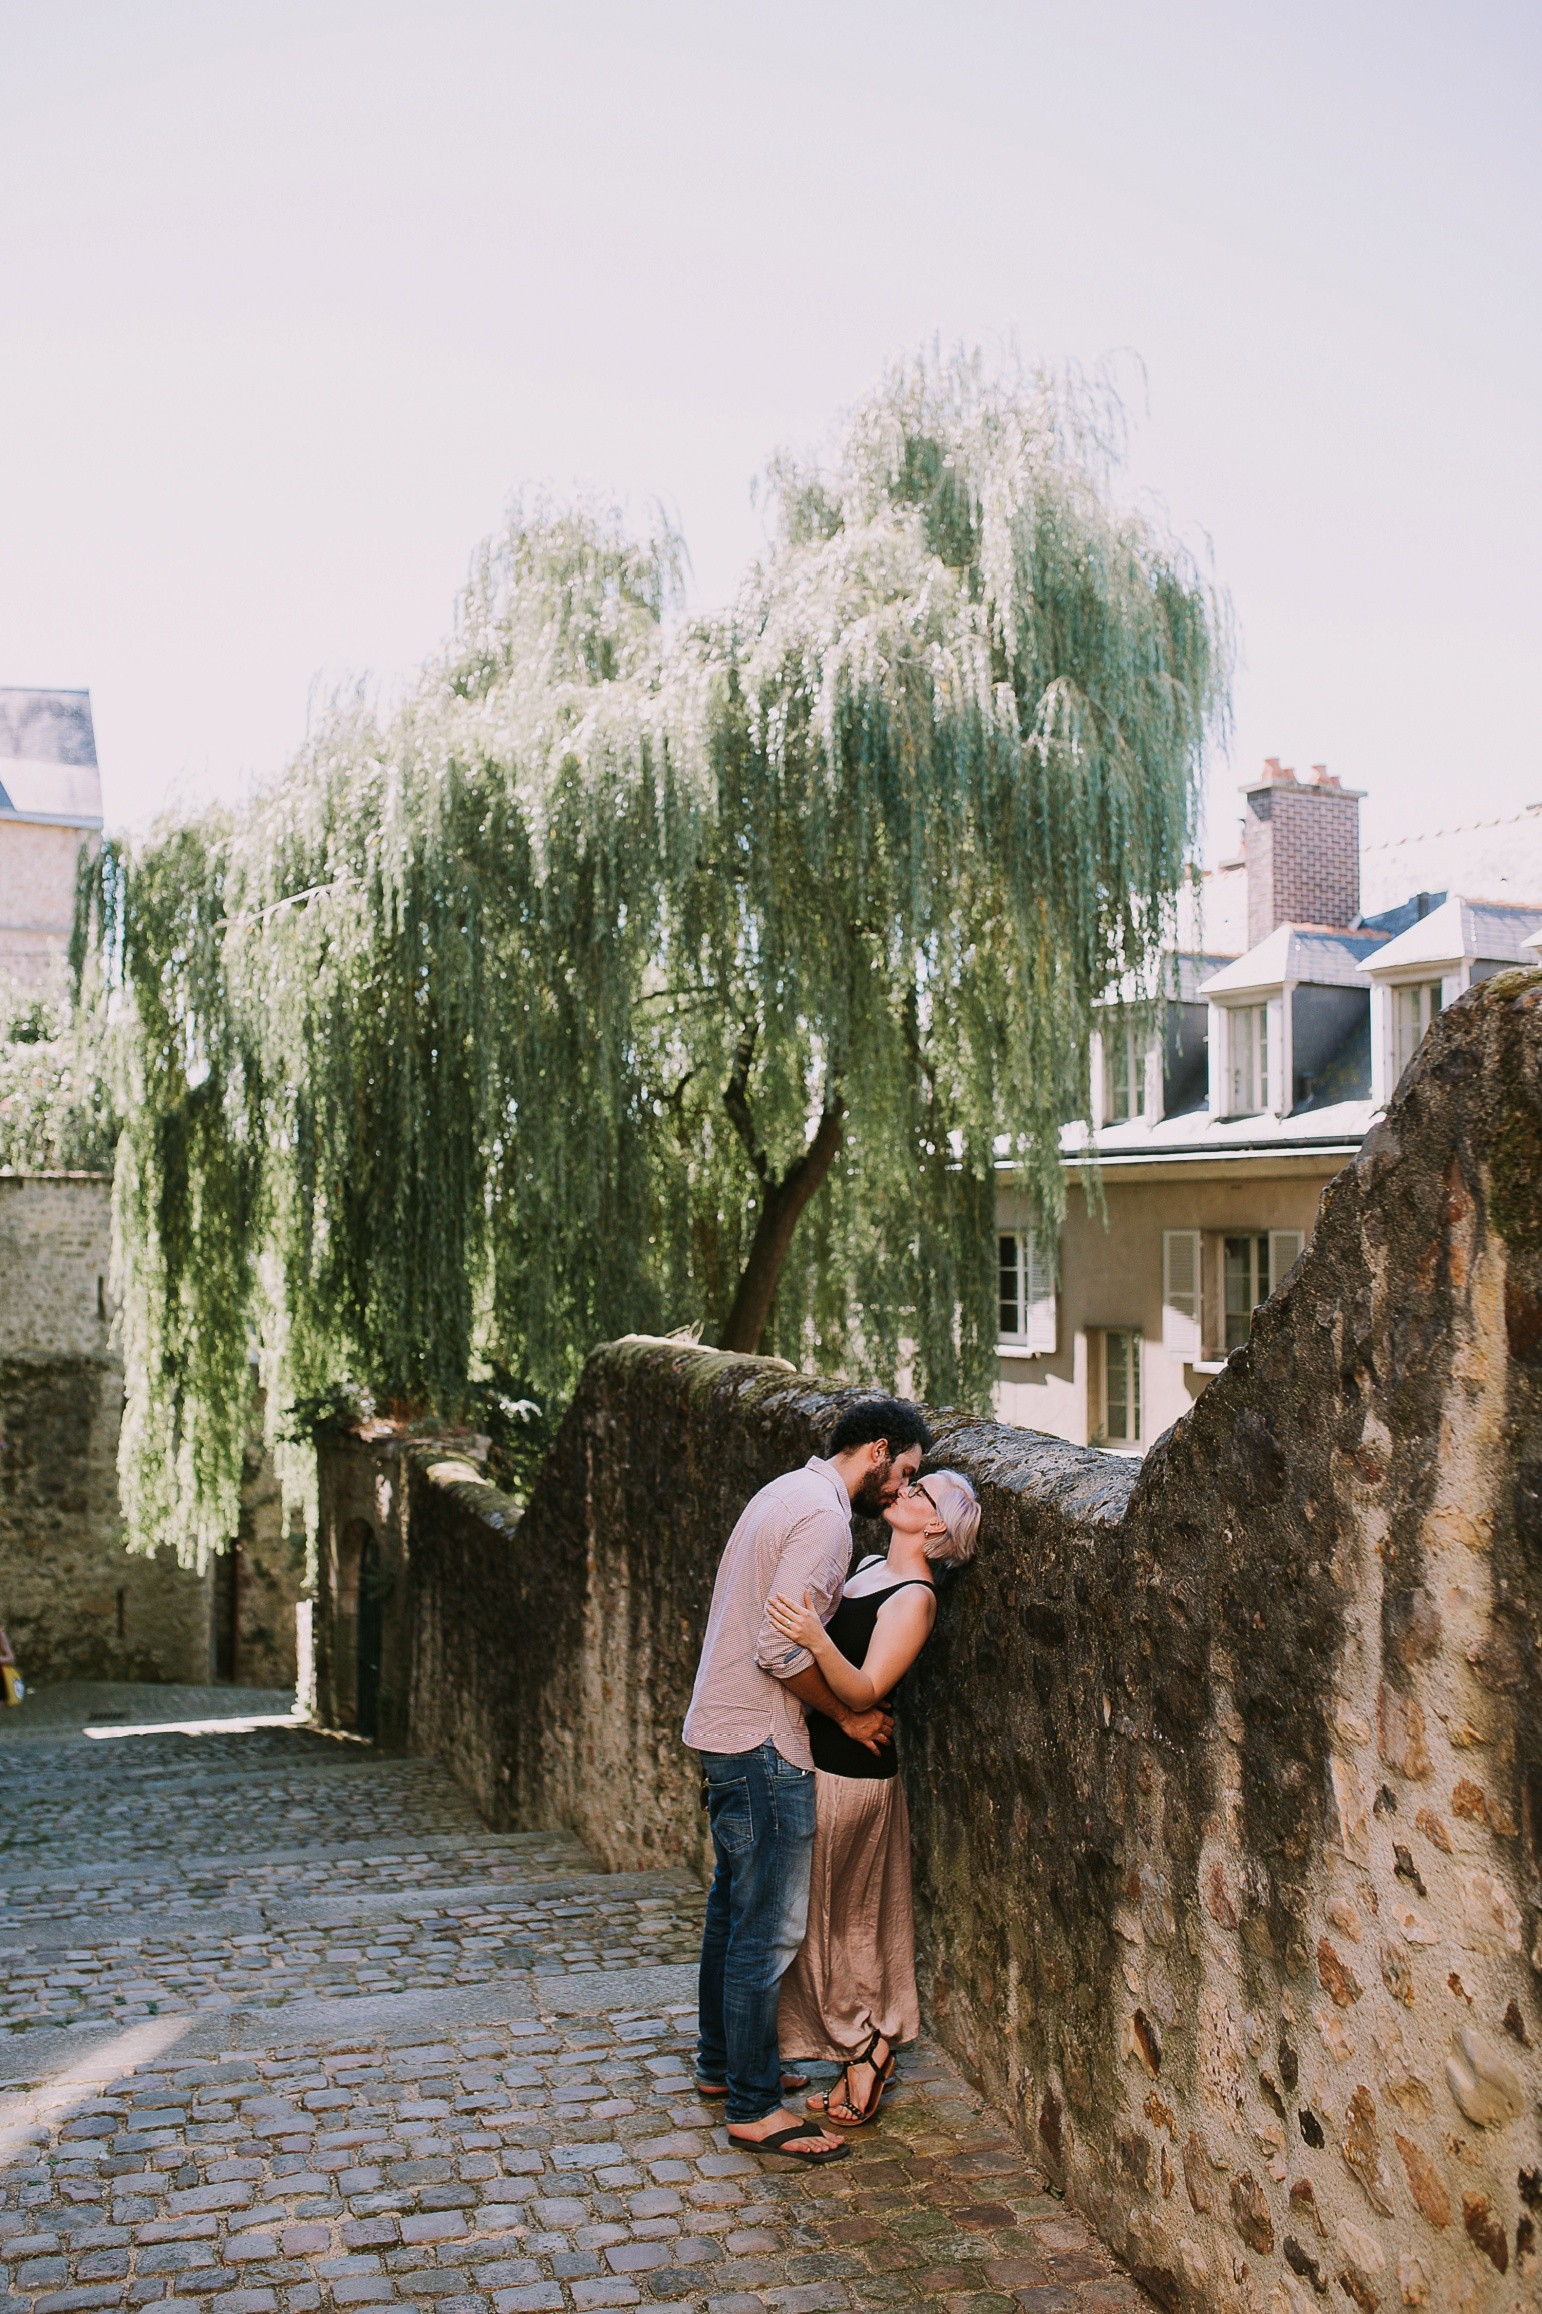 kateryna-photos-mariage-photographe-pornic-bretagne-nantes-couple-engagement-love-story-le-mans-wedding_0204.jpg